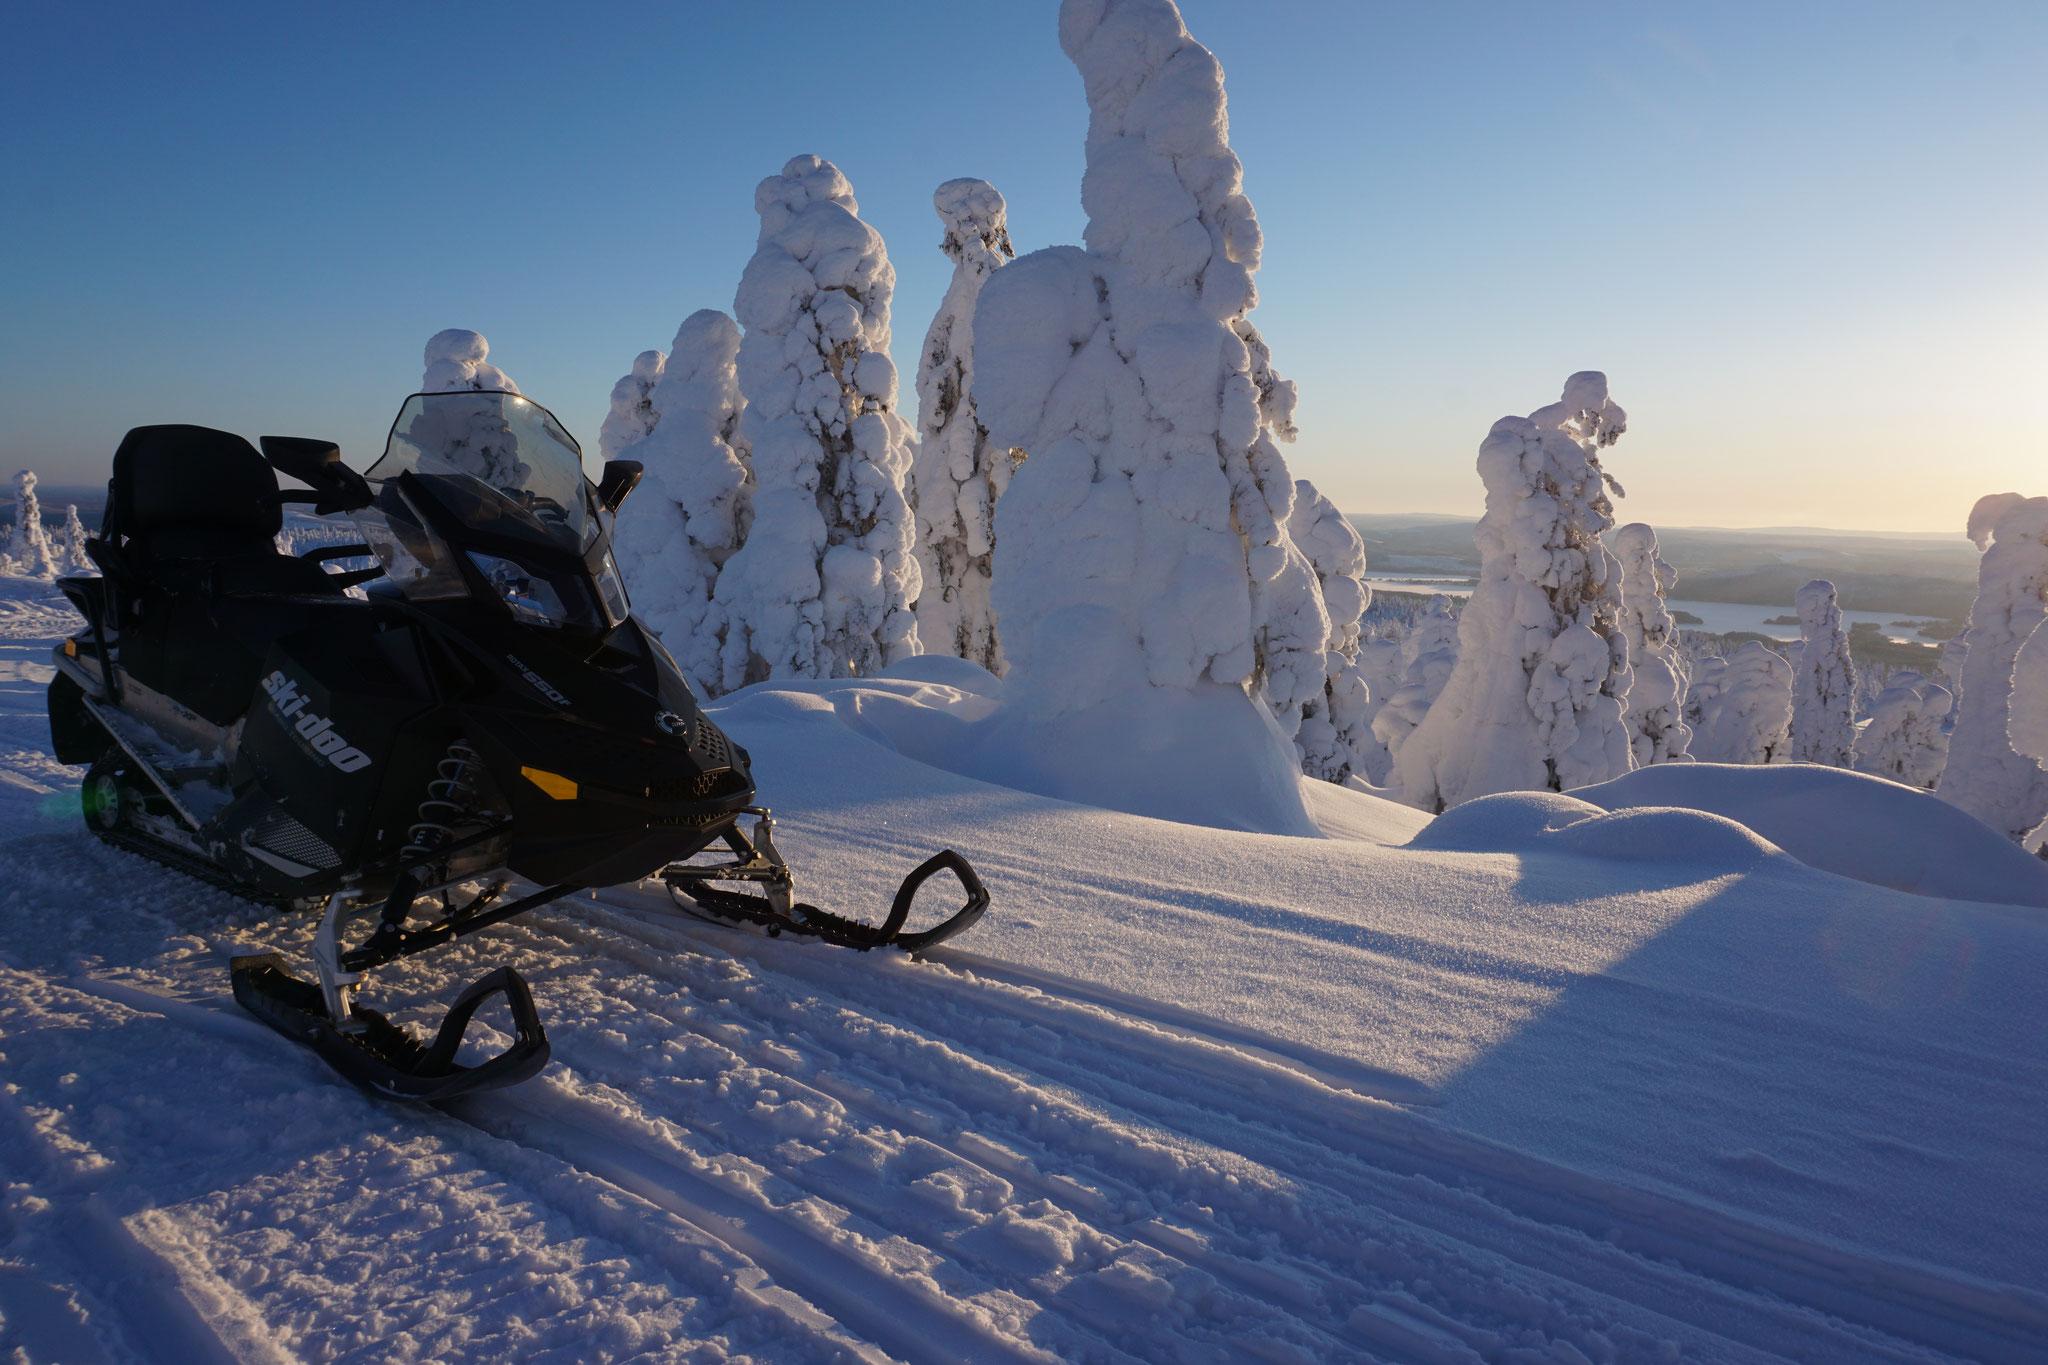 Tagesausflug mit dem Schneemobil